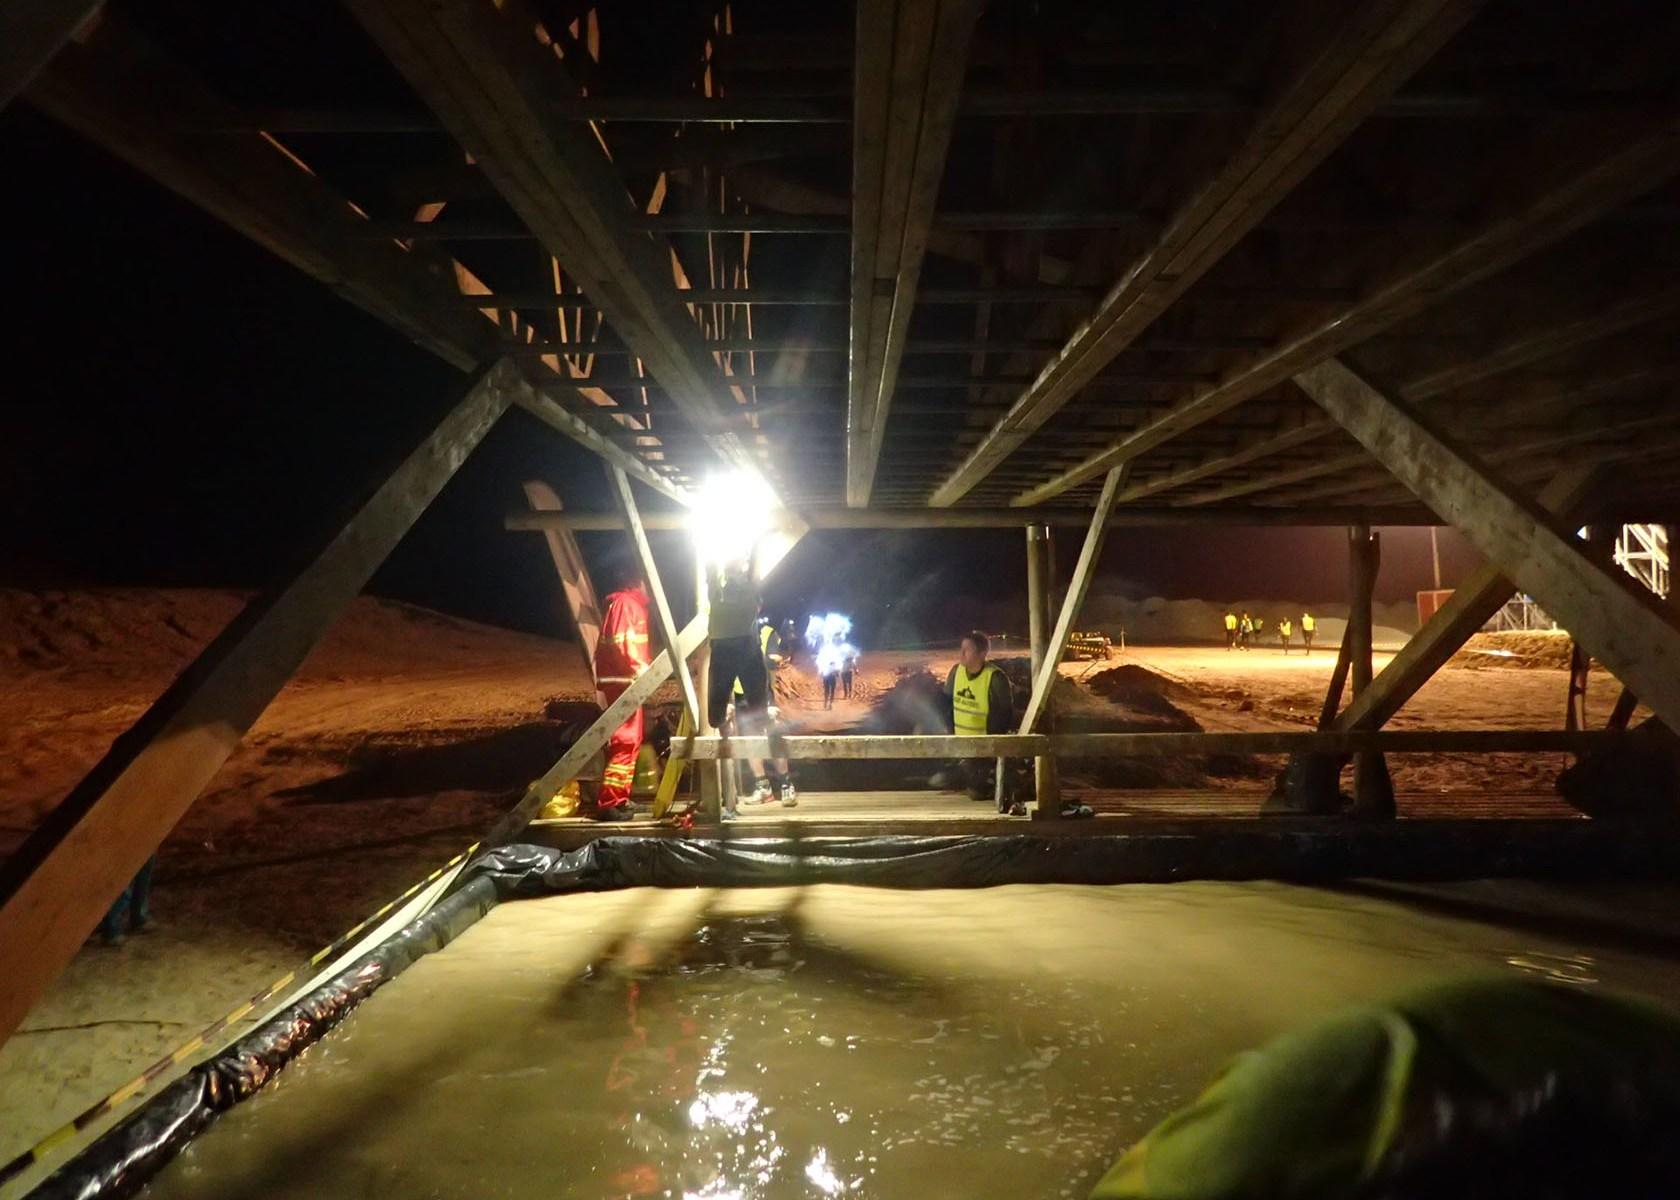 Mud Masters Obstacle Run Night Shift, Hindernislauf Deutschland, Hindernis Monkey Bars by night